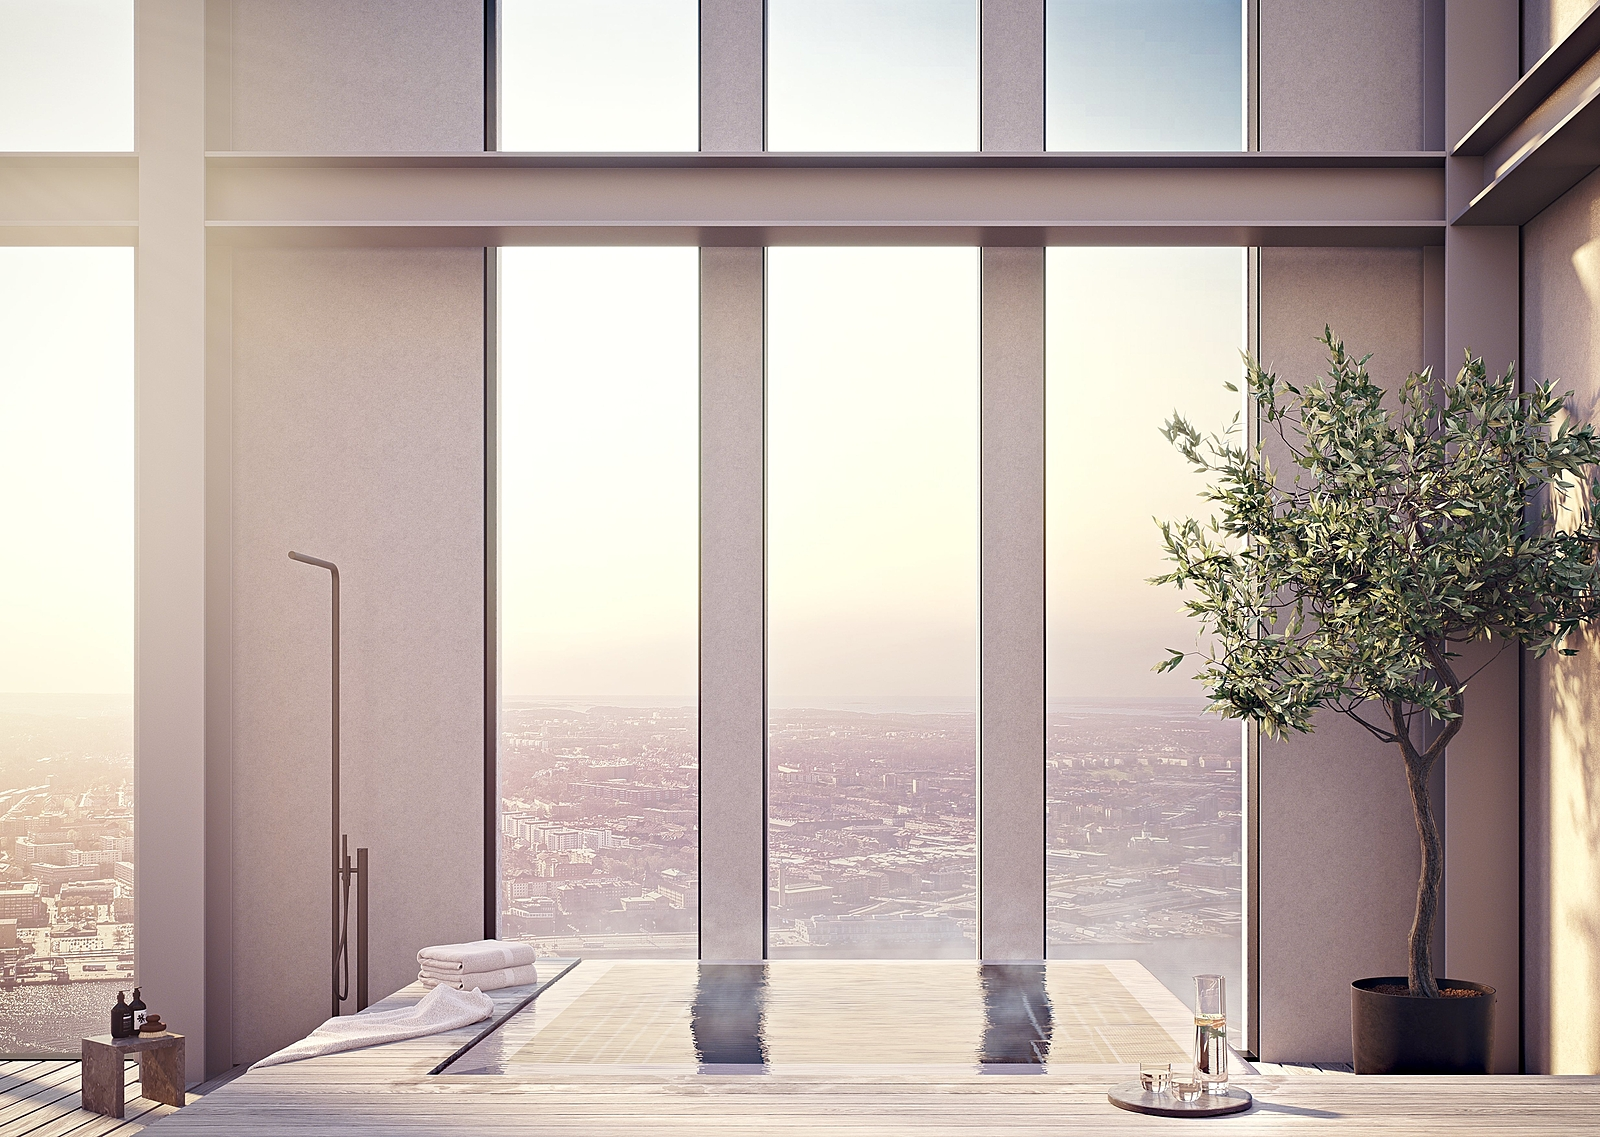 Karlatornet Penthouse 005 - Terrass Pool v5.0001